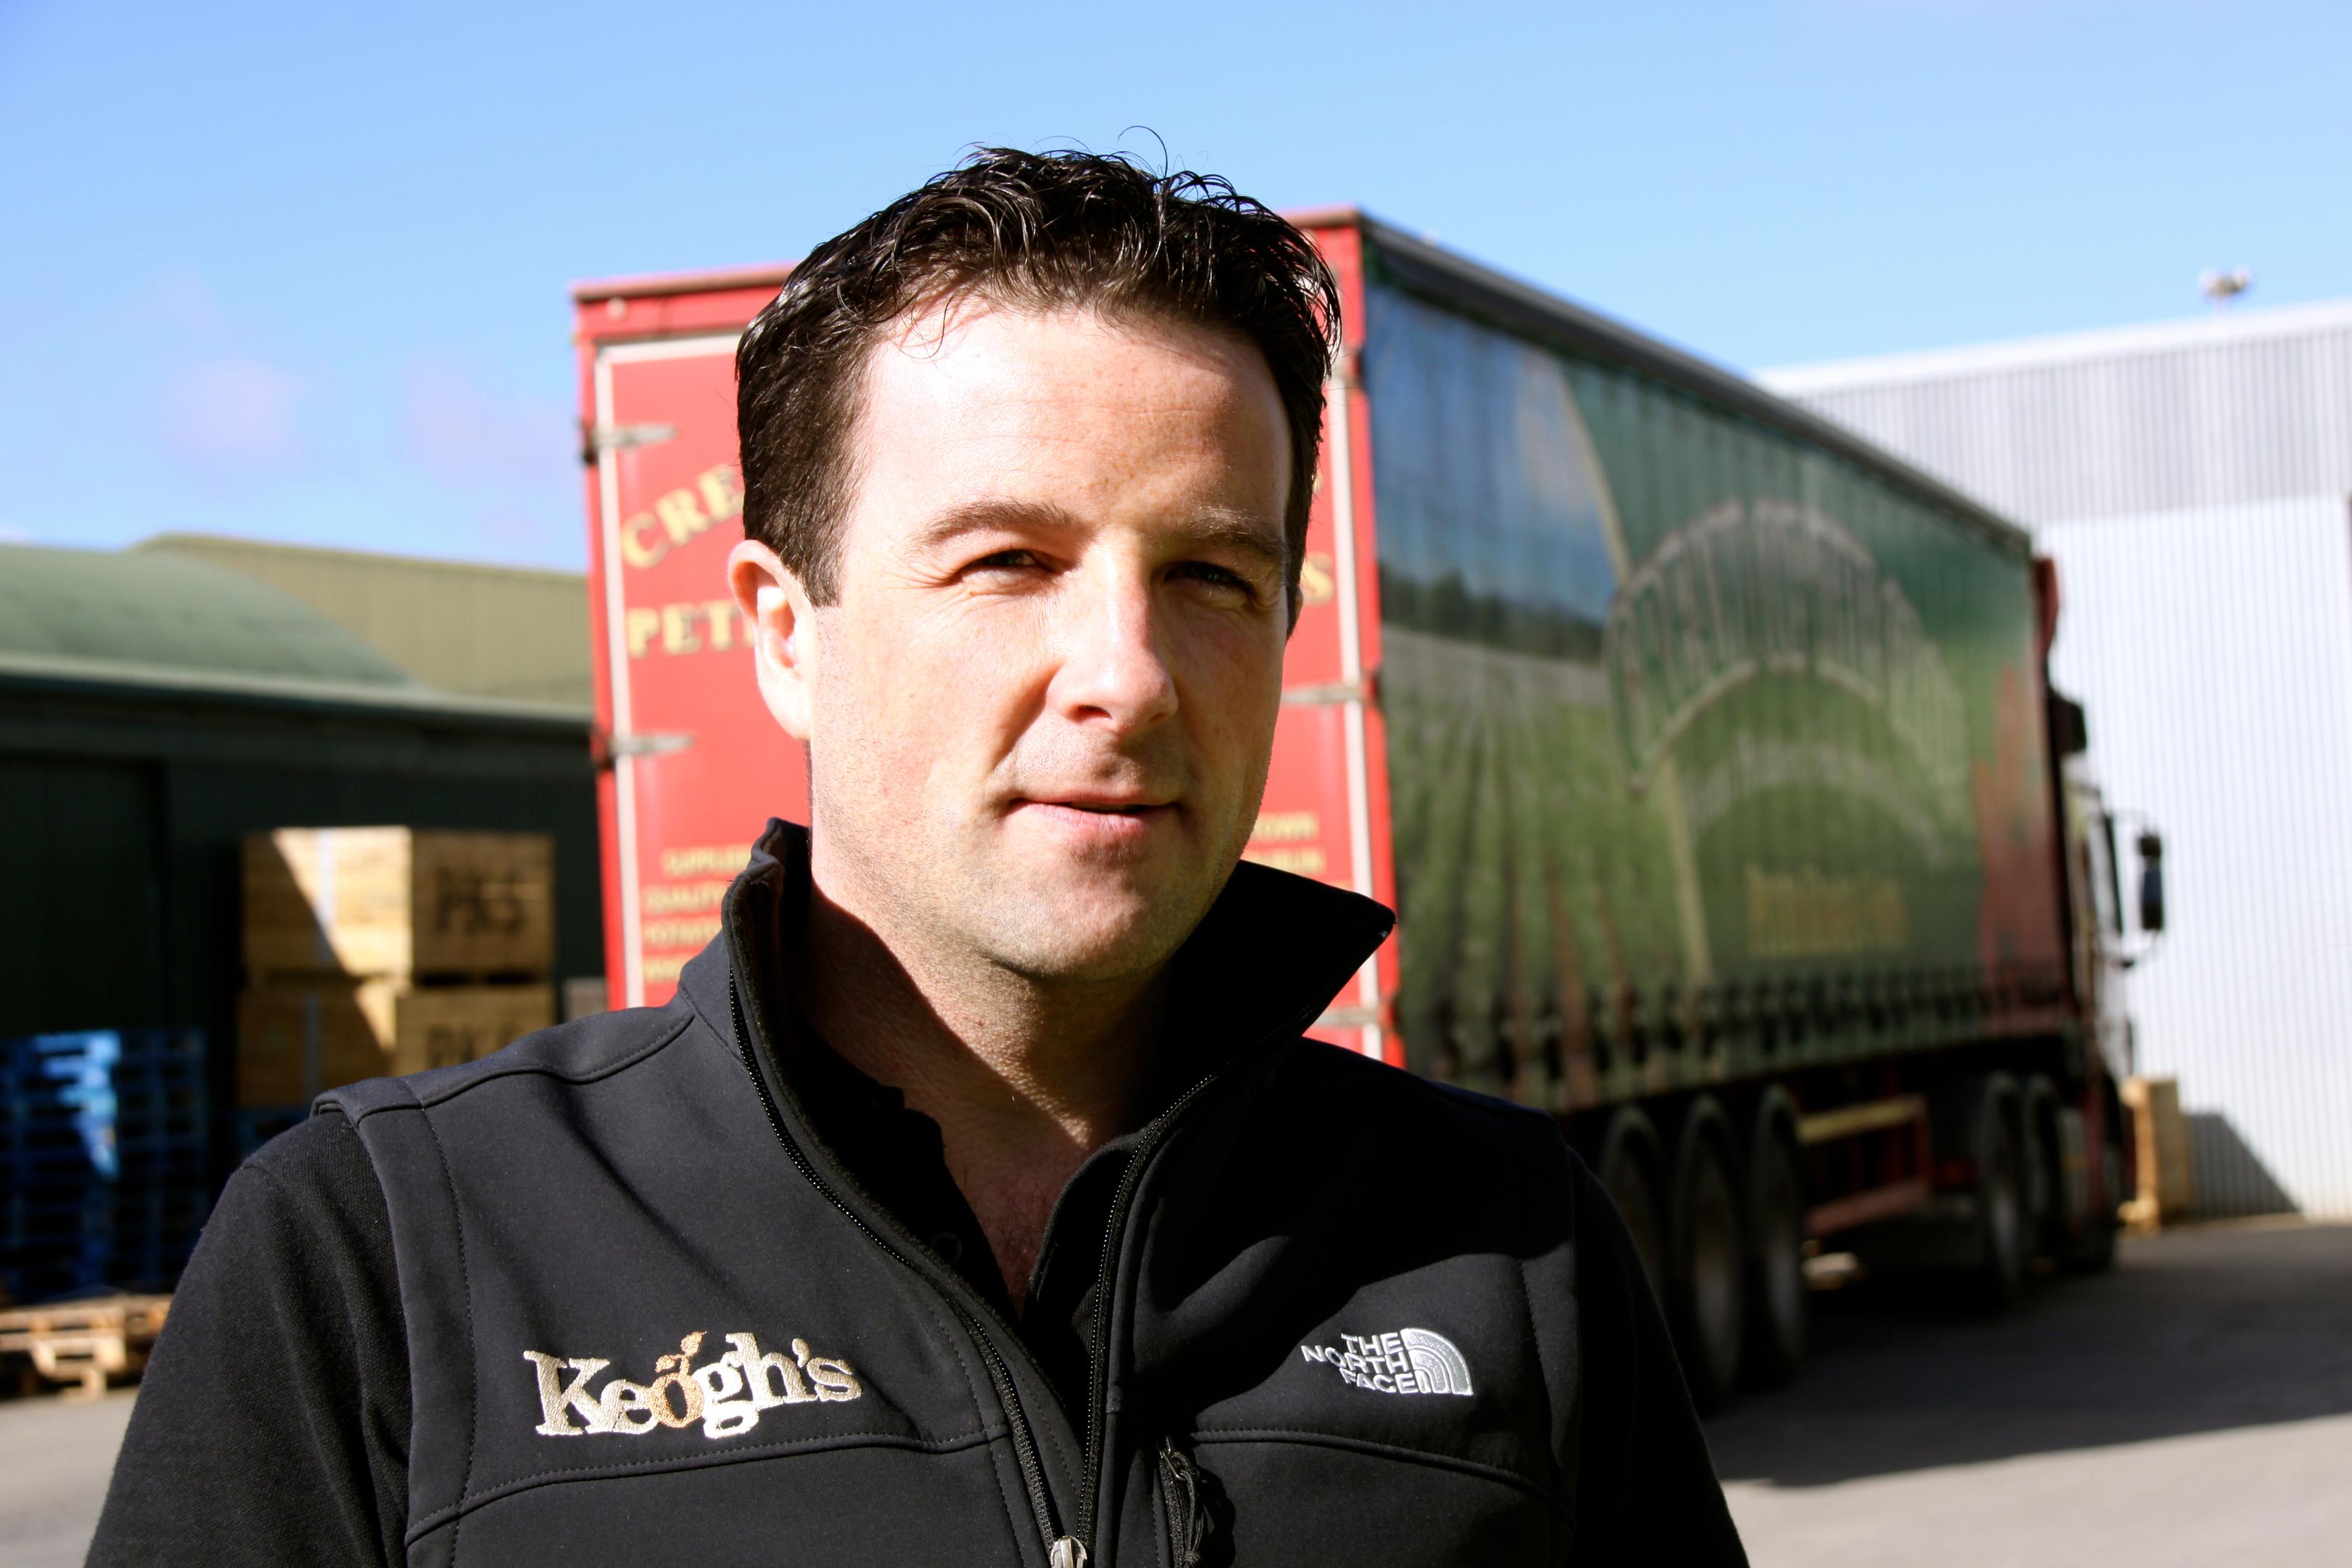 Tom Keogh